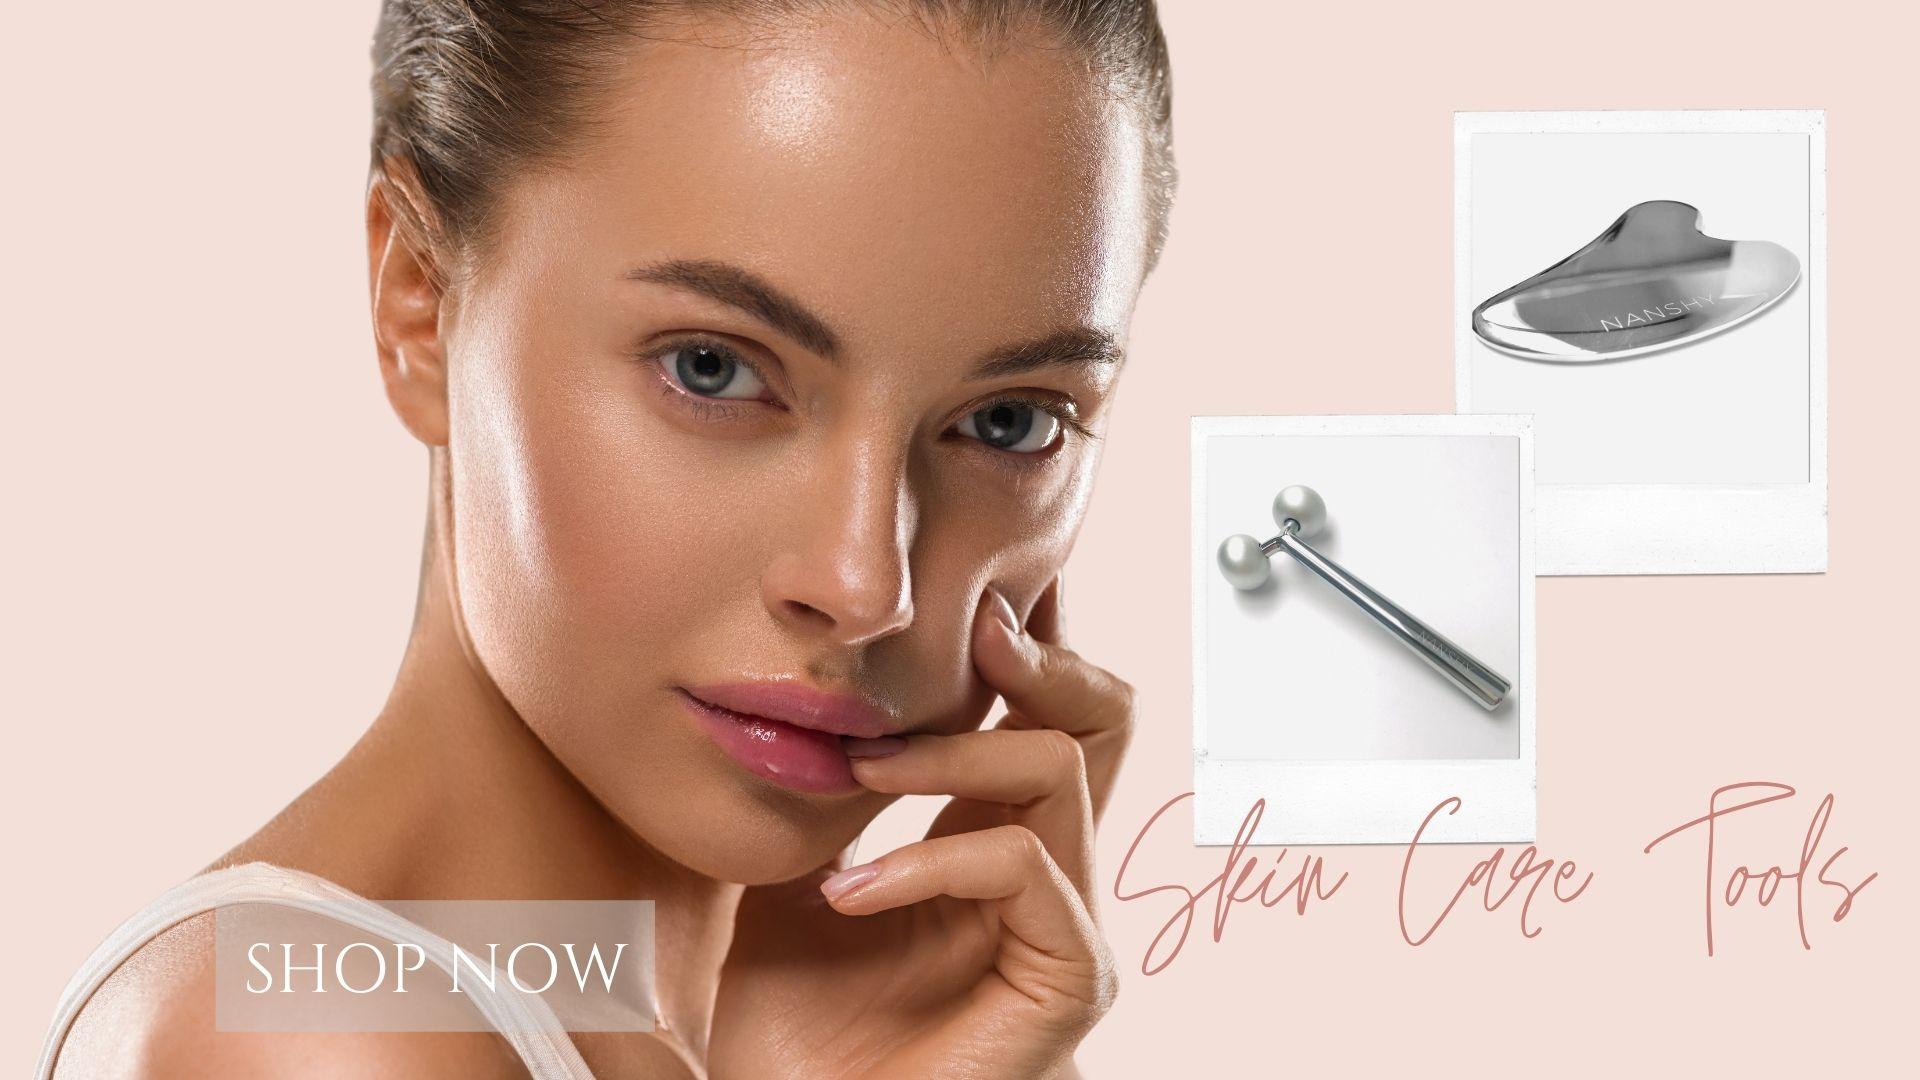 Skin Care Tools 9